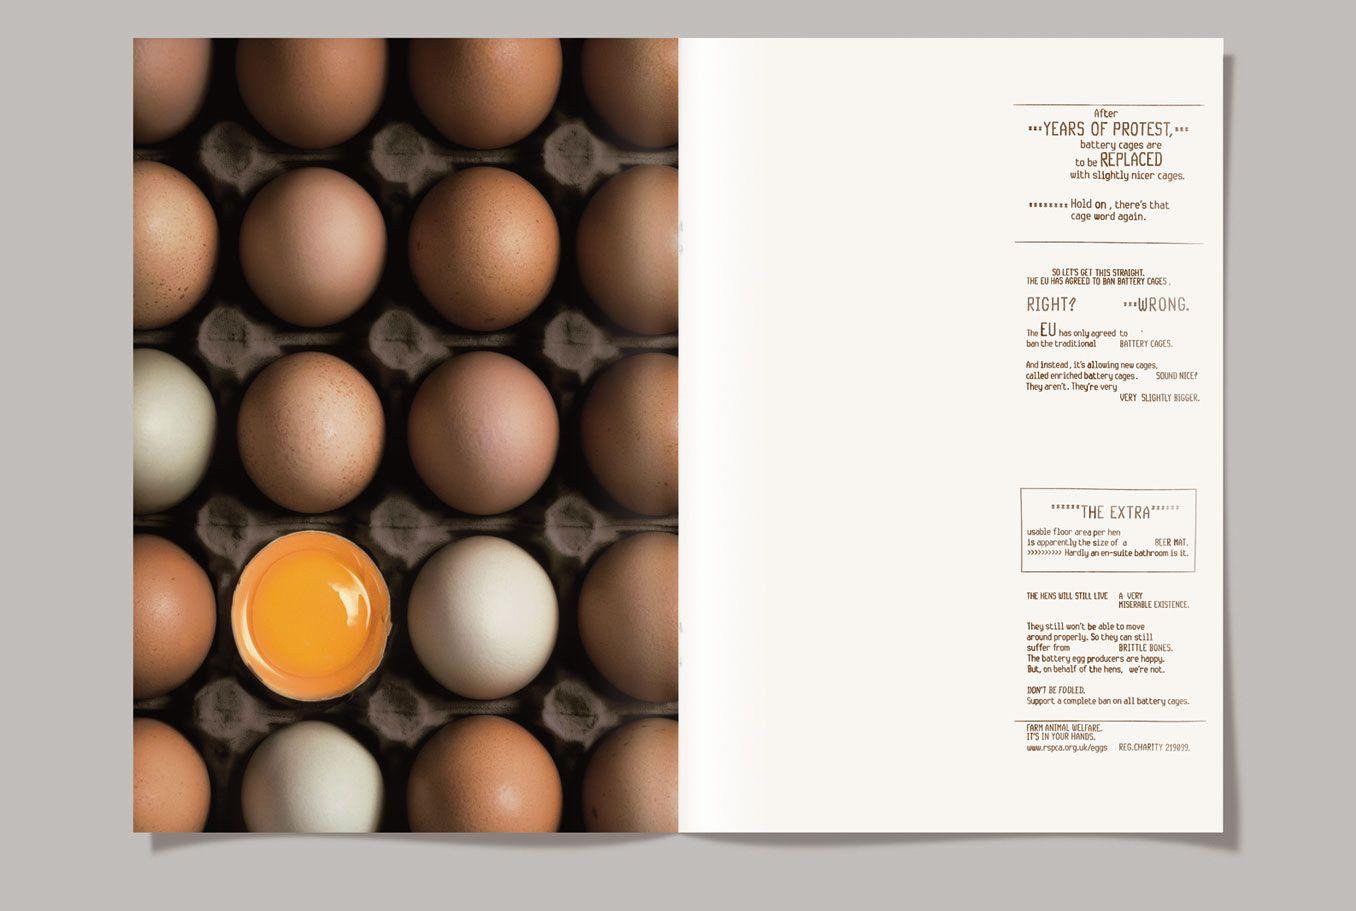 RSPCA|Eggs